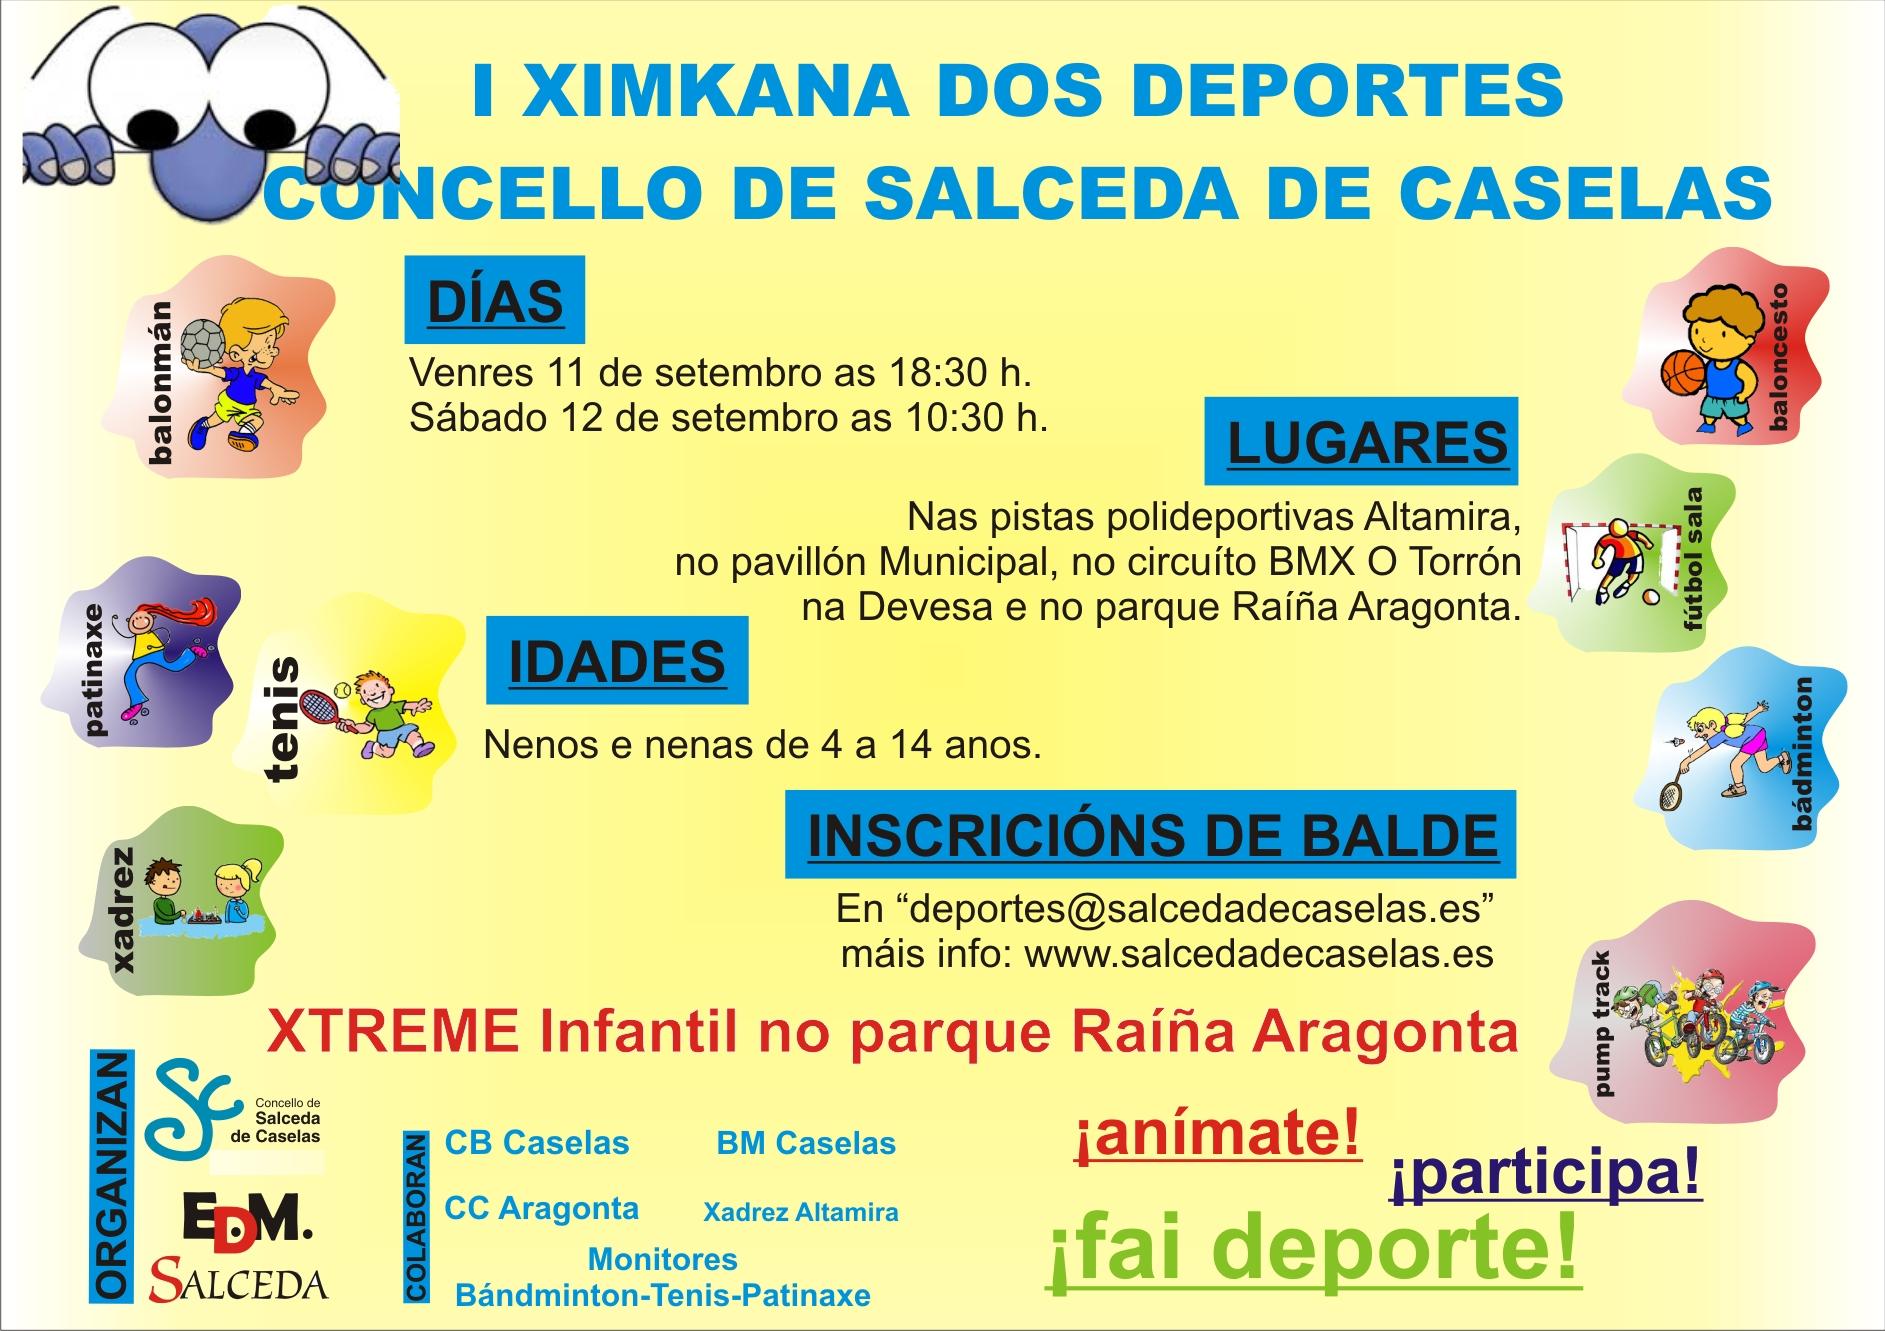 I XINCANA DOS DEPORTES CONCELLOD E SALCEDA 11-12 SET